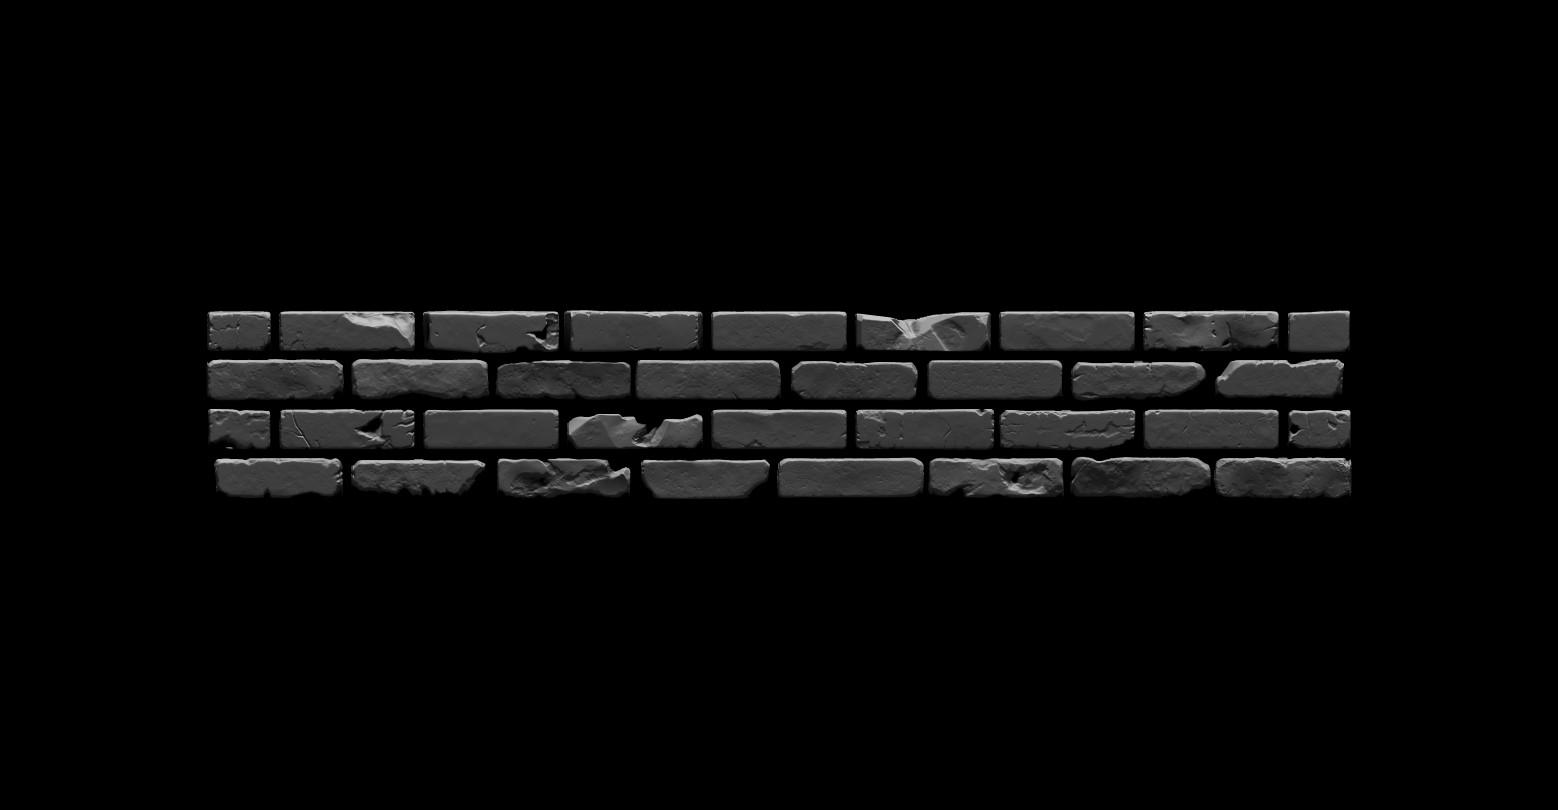 Bela csampai brick wall 01 render zb 04